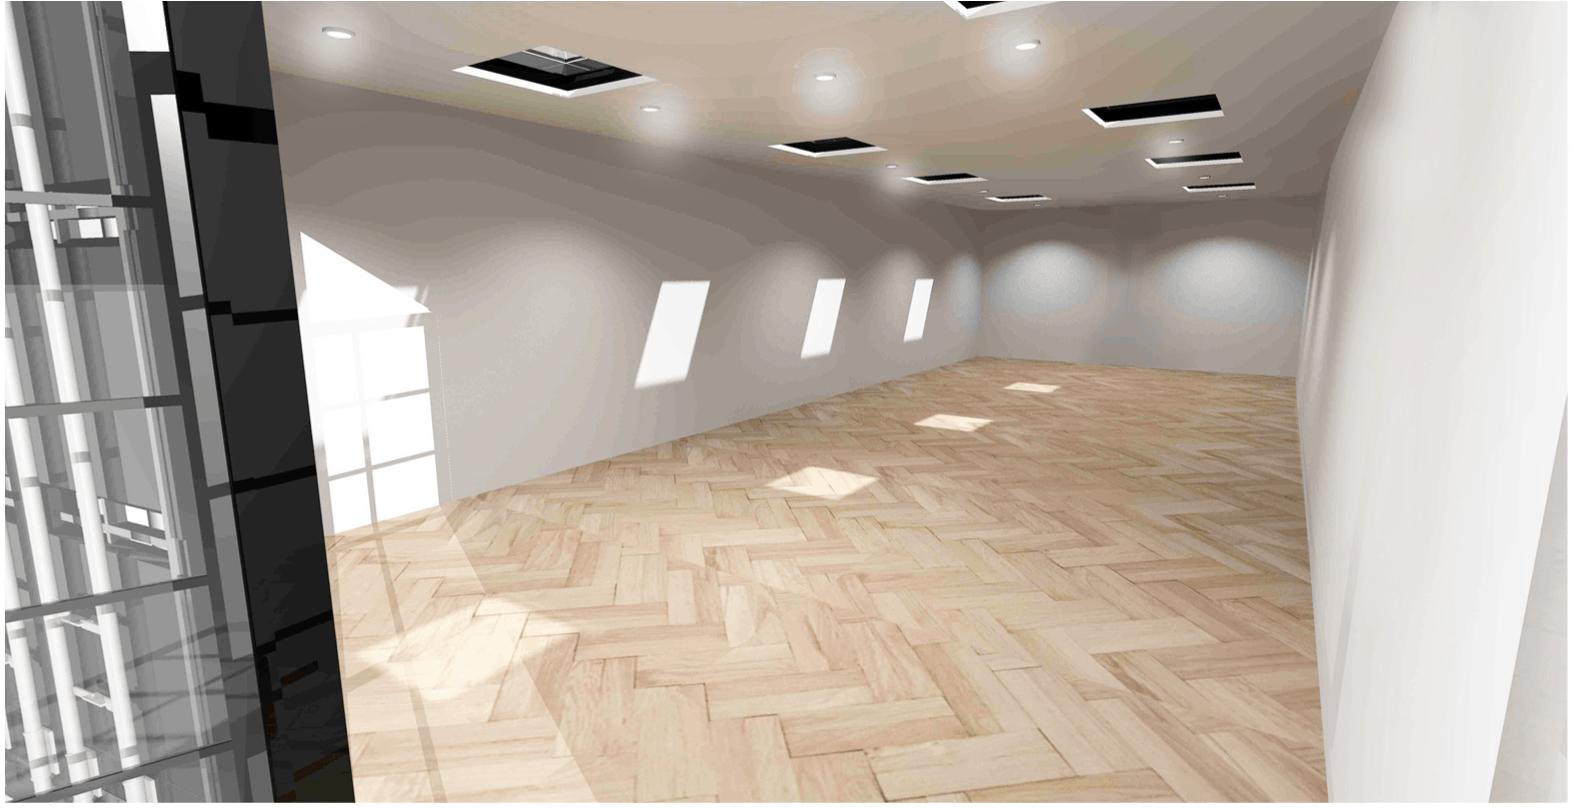 Havwoods Container Classroom concept design